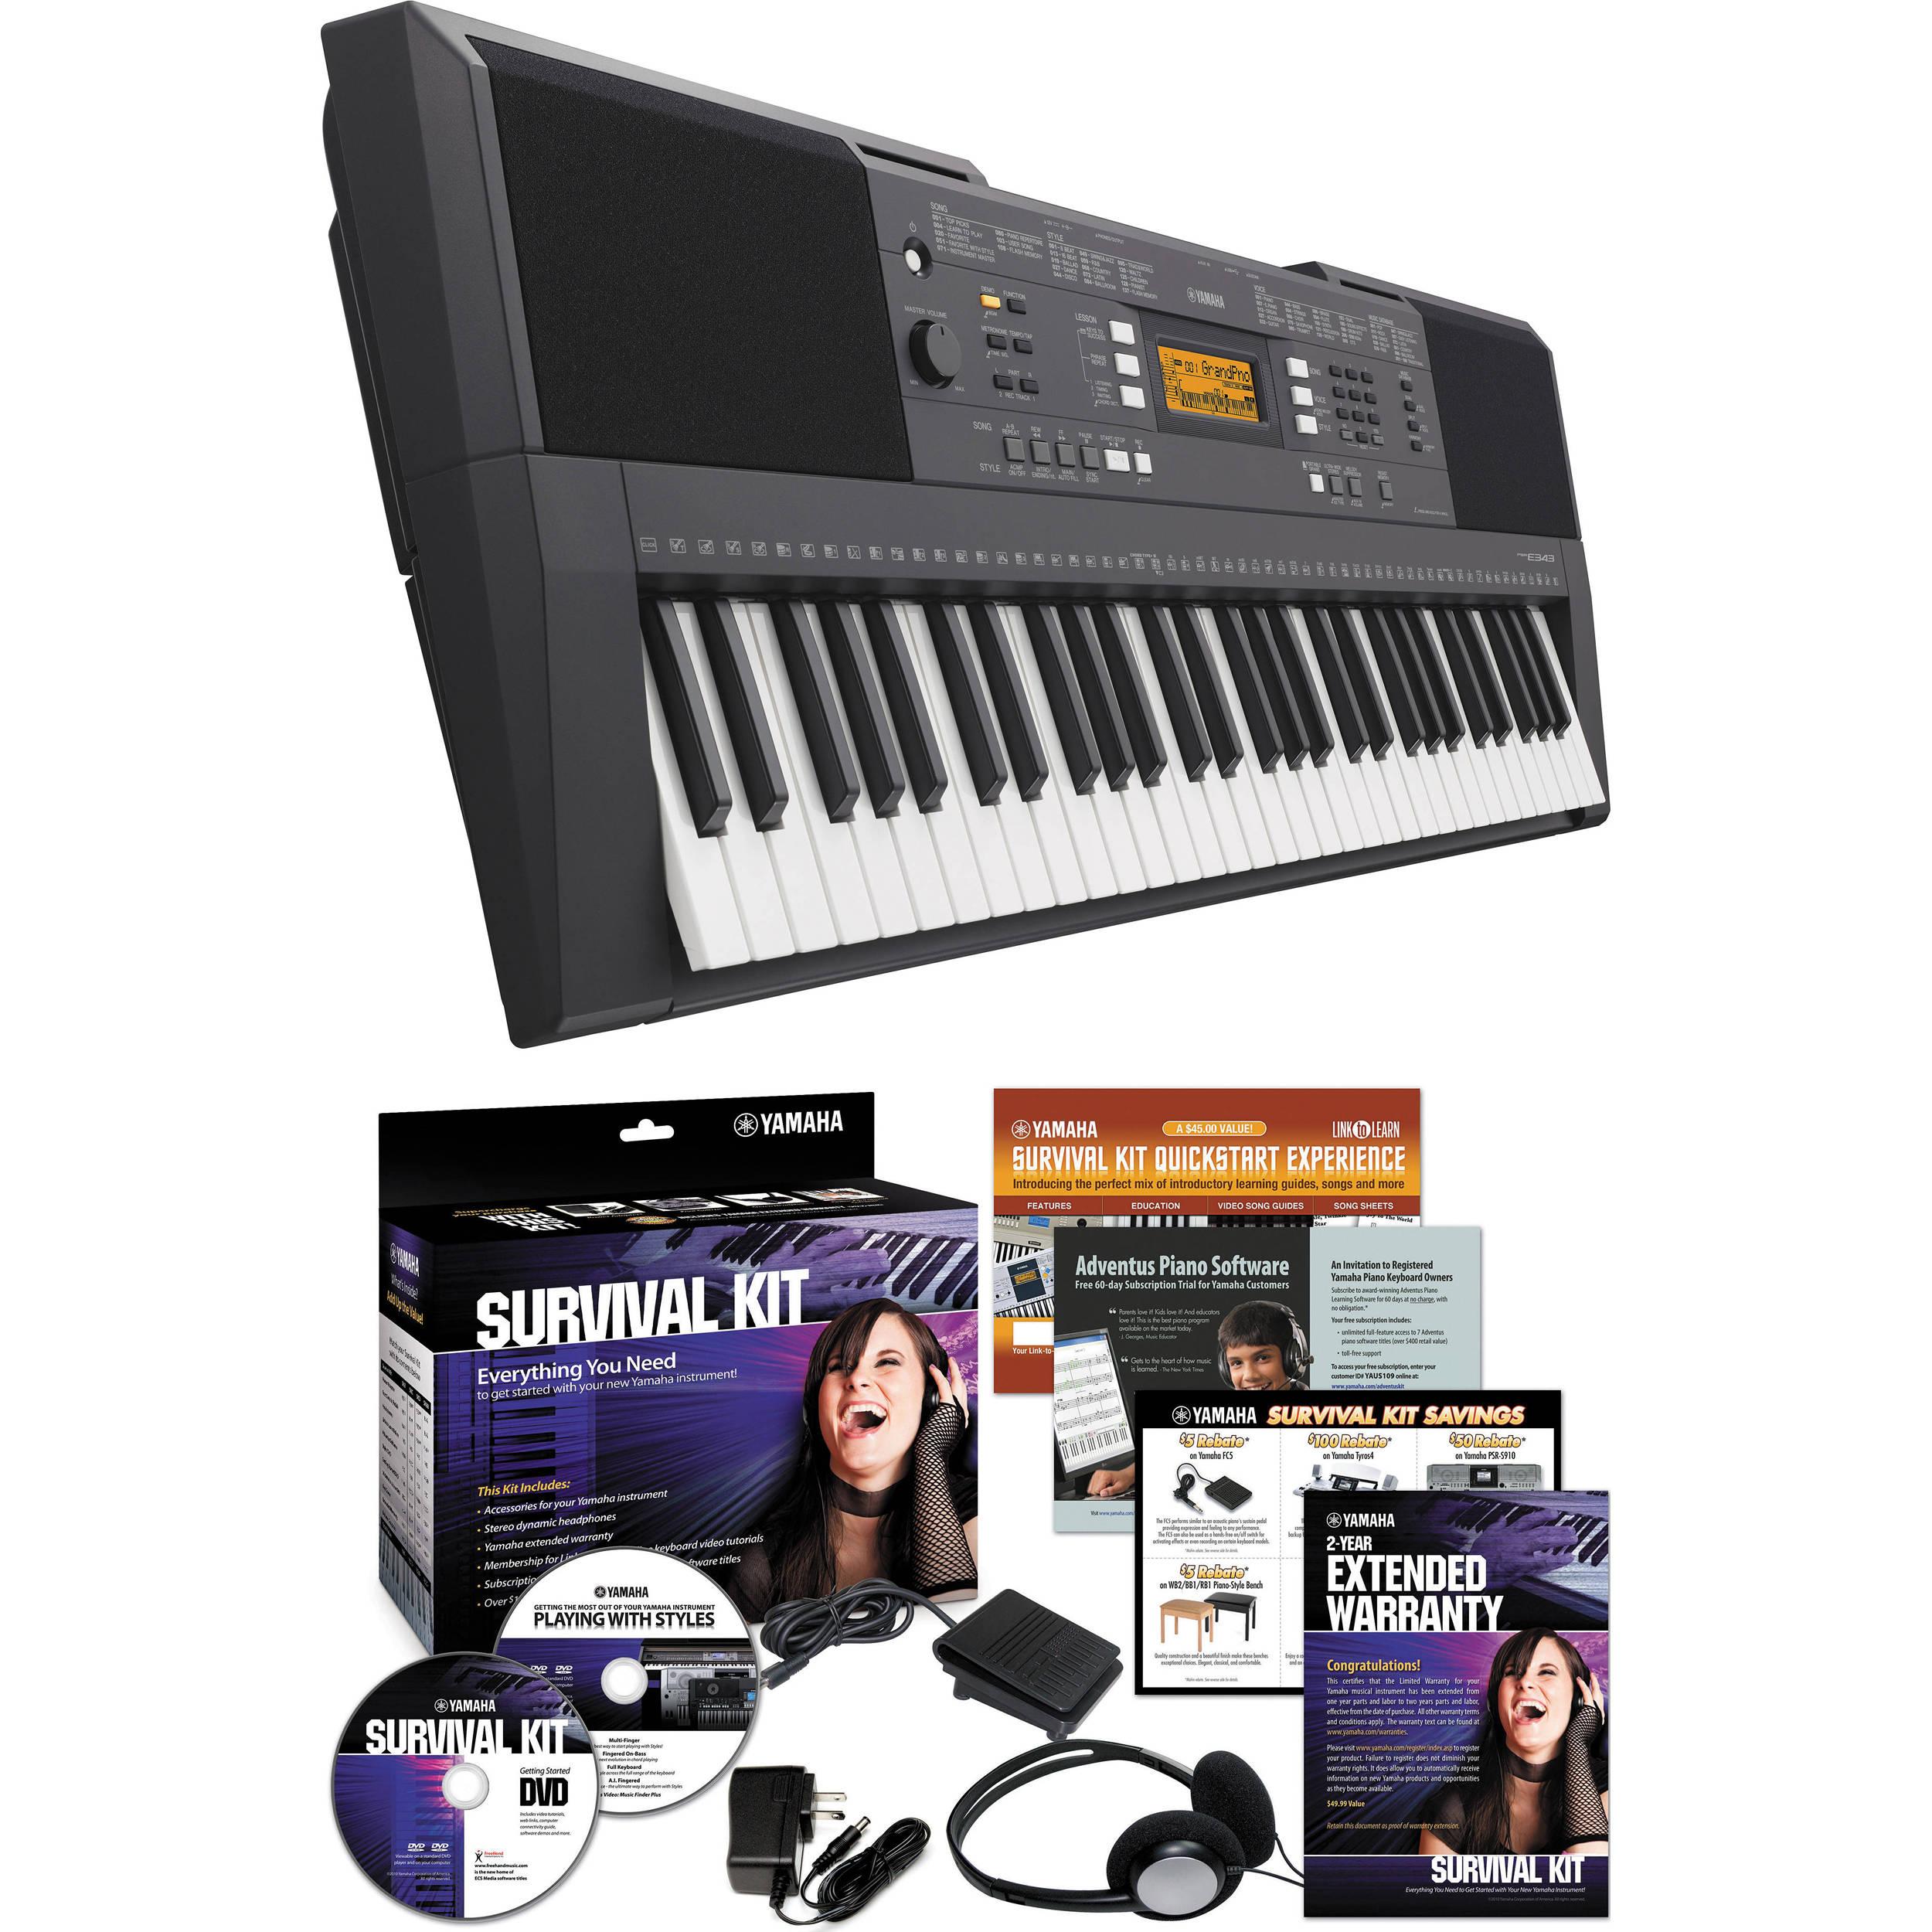 yamaha psr e343 portable keyboard with survival kit psre343 kit. Black Bedroom Furniture Sets. Home Design Ideas